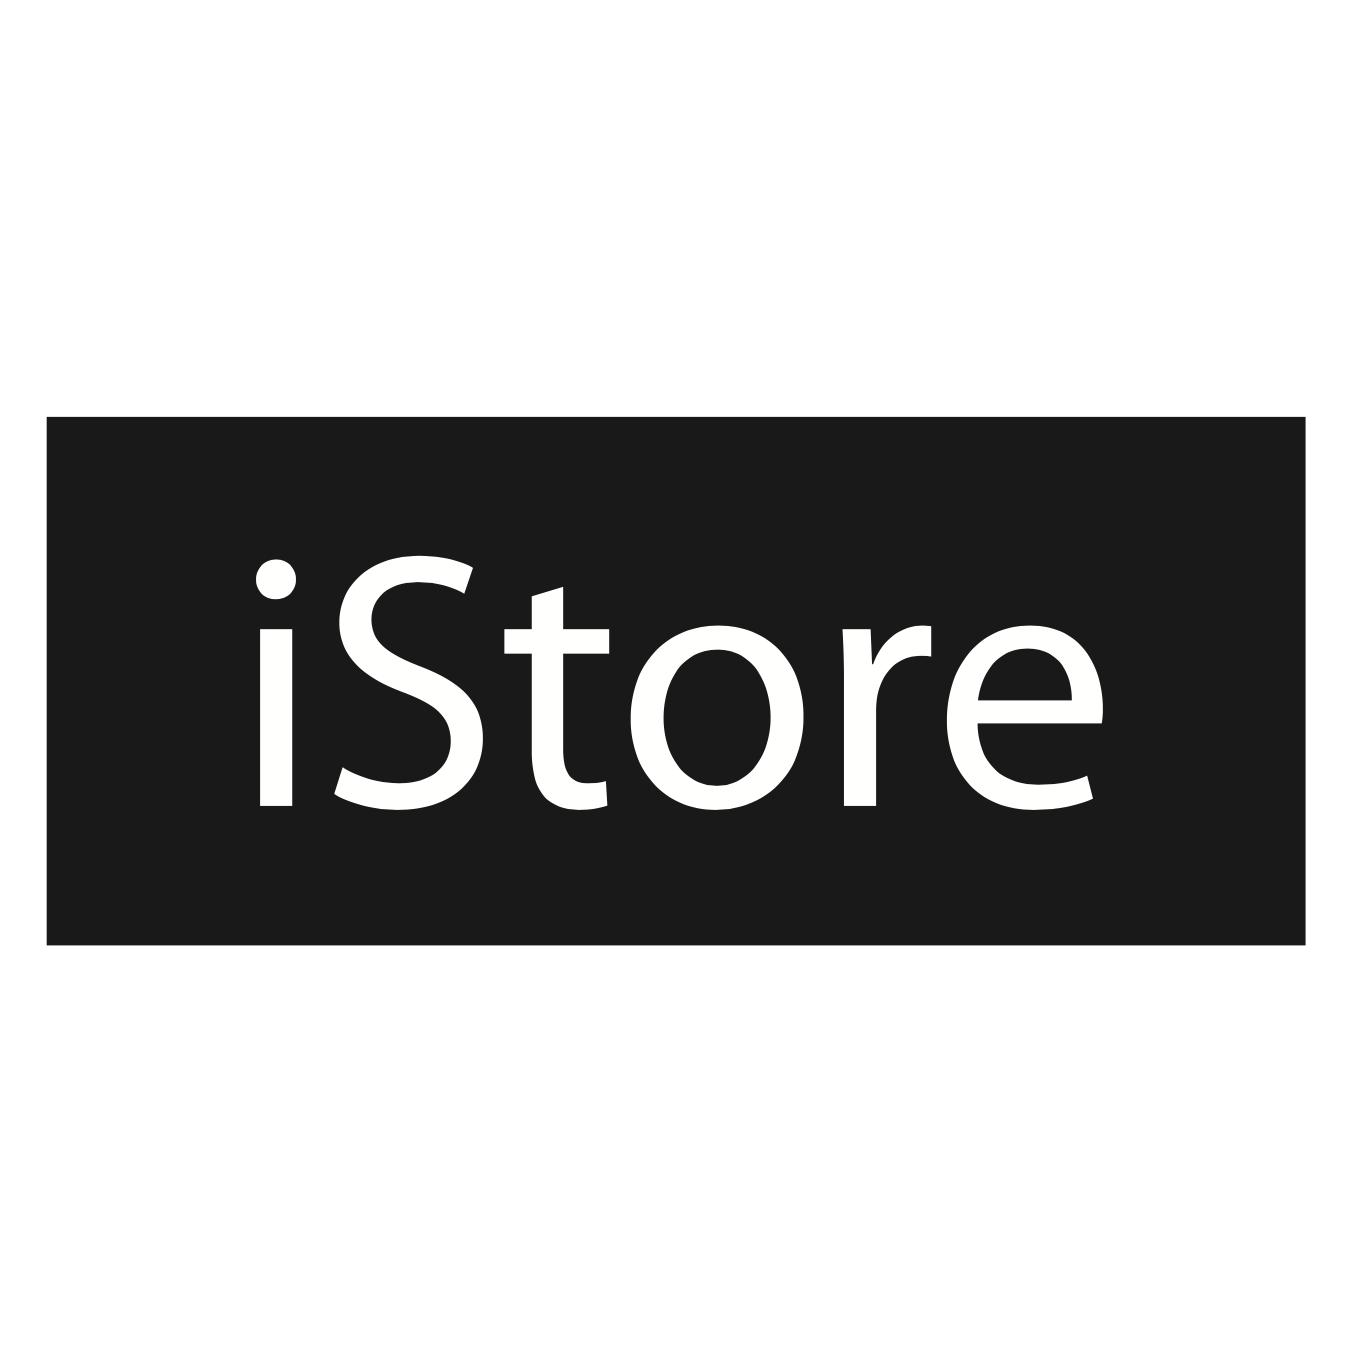 24-inch iMac with Retina 4.5K display | Apple M1 Chip | 7 core GPU | 256GB | Silver